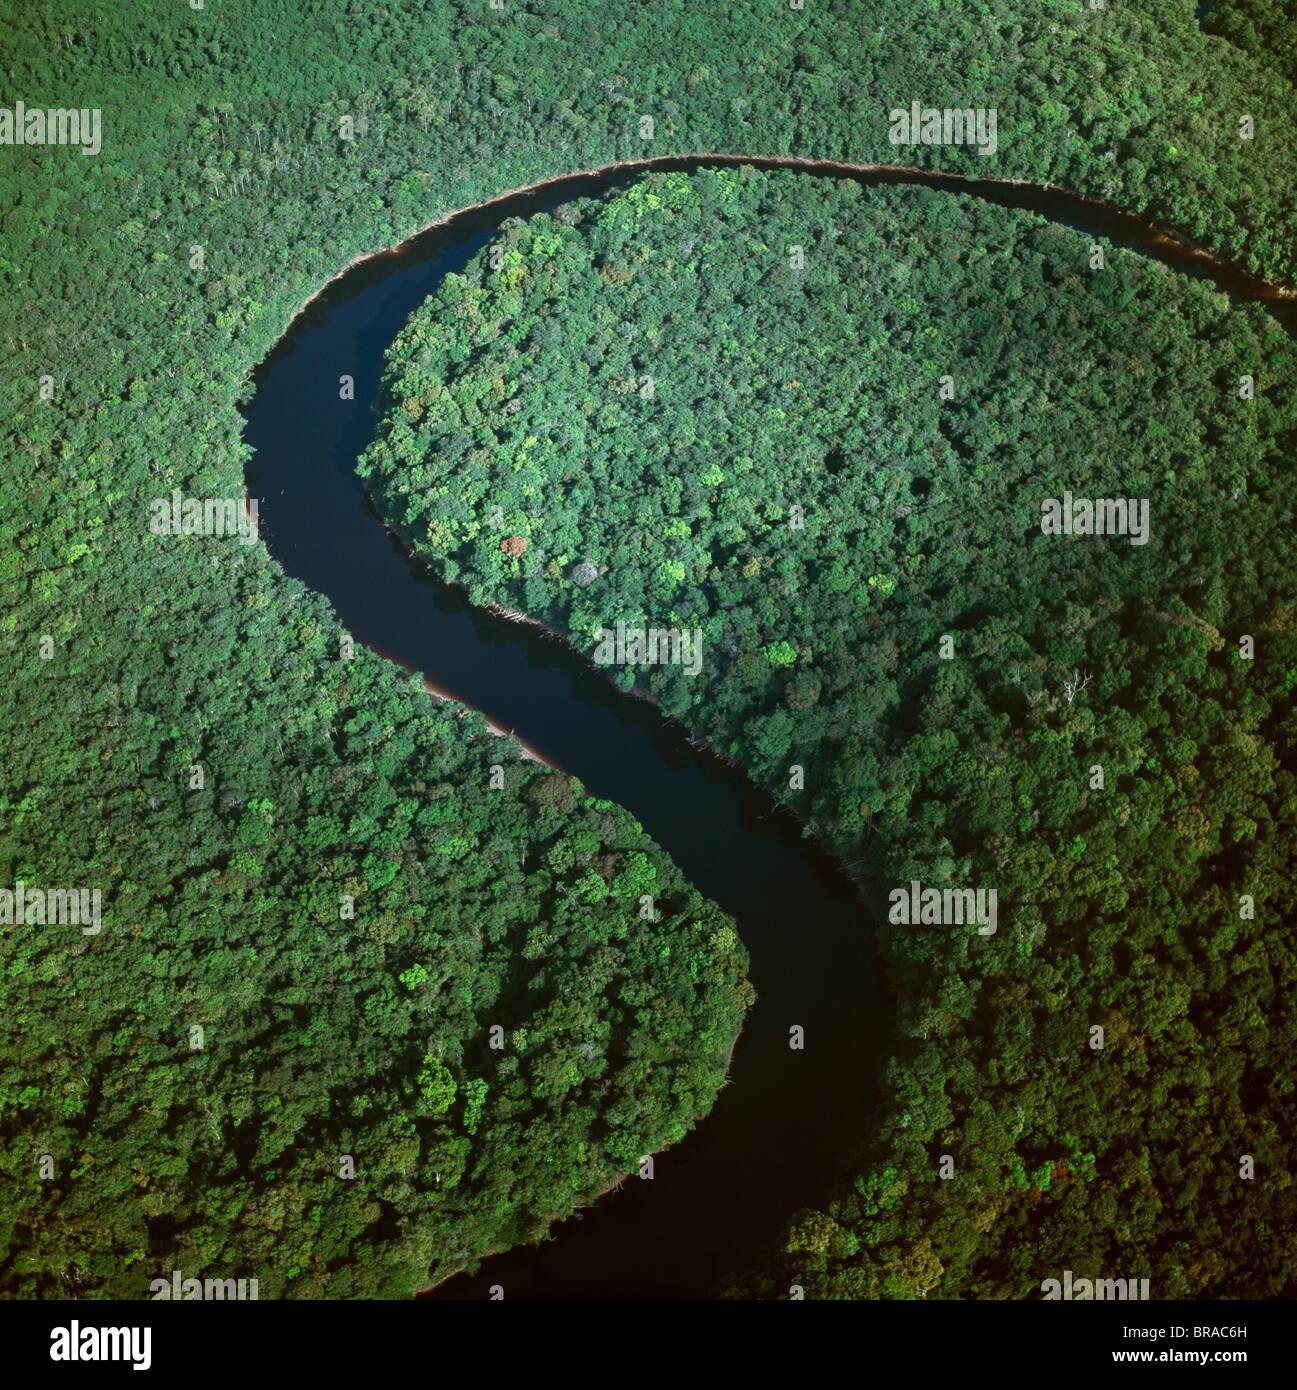 Aerial image of the Kako River, Upper Mazaruni District, Guyana, South America - Stock Image